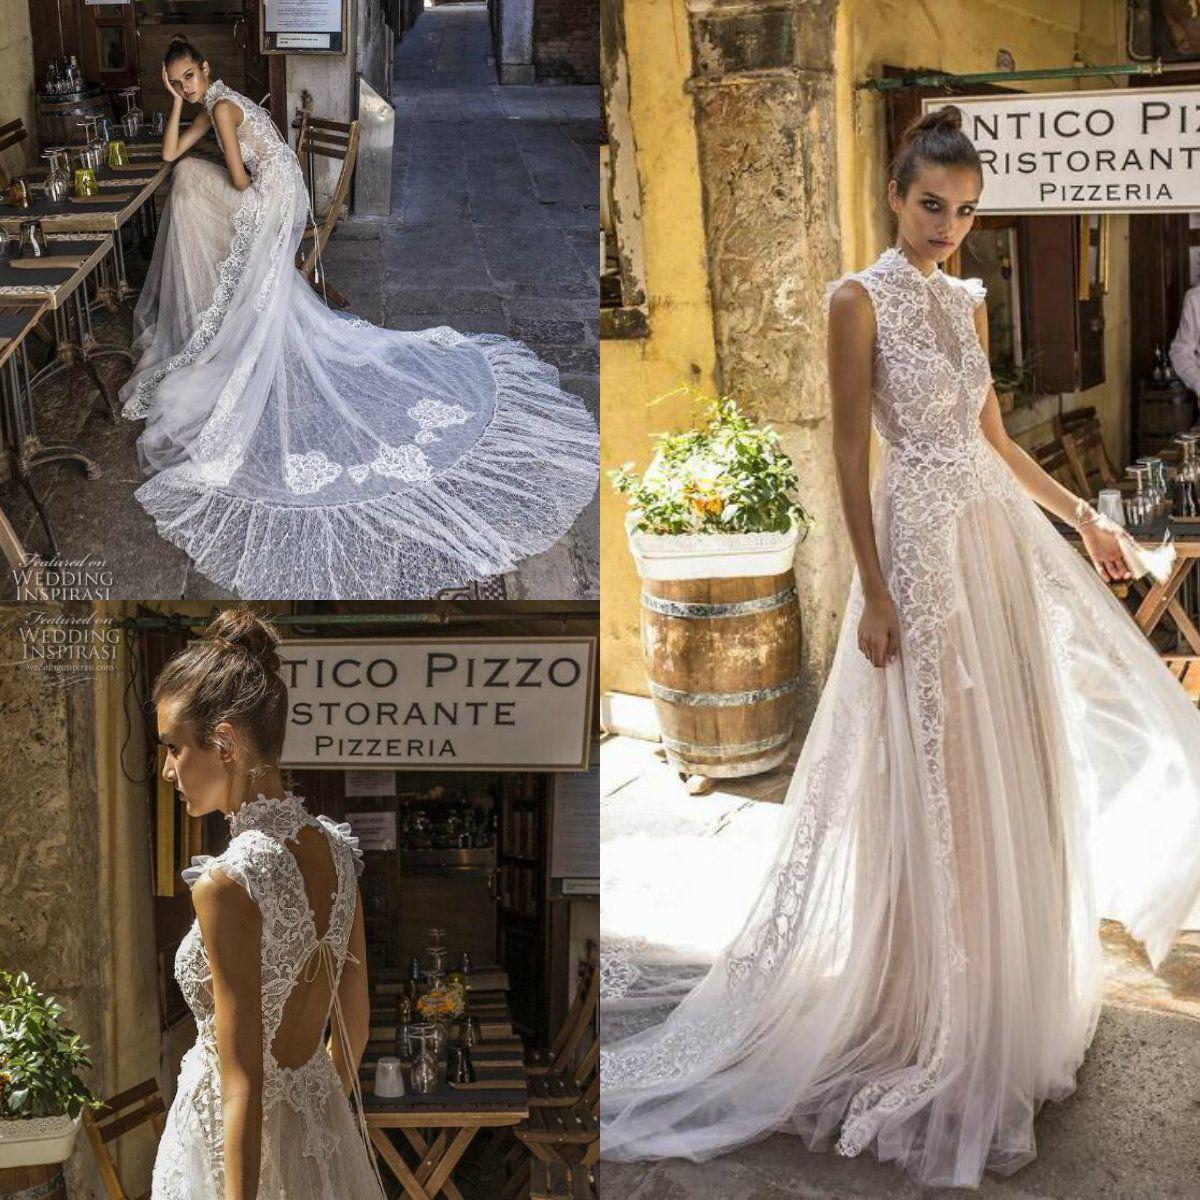 6325b421e67 Pinella Passaro 2019 Lace Wedding Dresses High Collar Sleeveless Tulle  Sweep Train Boho Wedding Dress Cheap Bridal Gowns Custom Made Wedding  Dresses Wedding ...